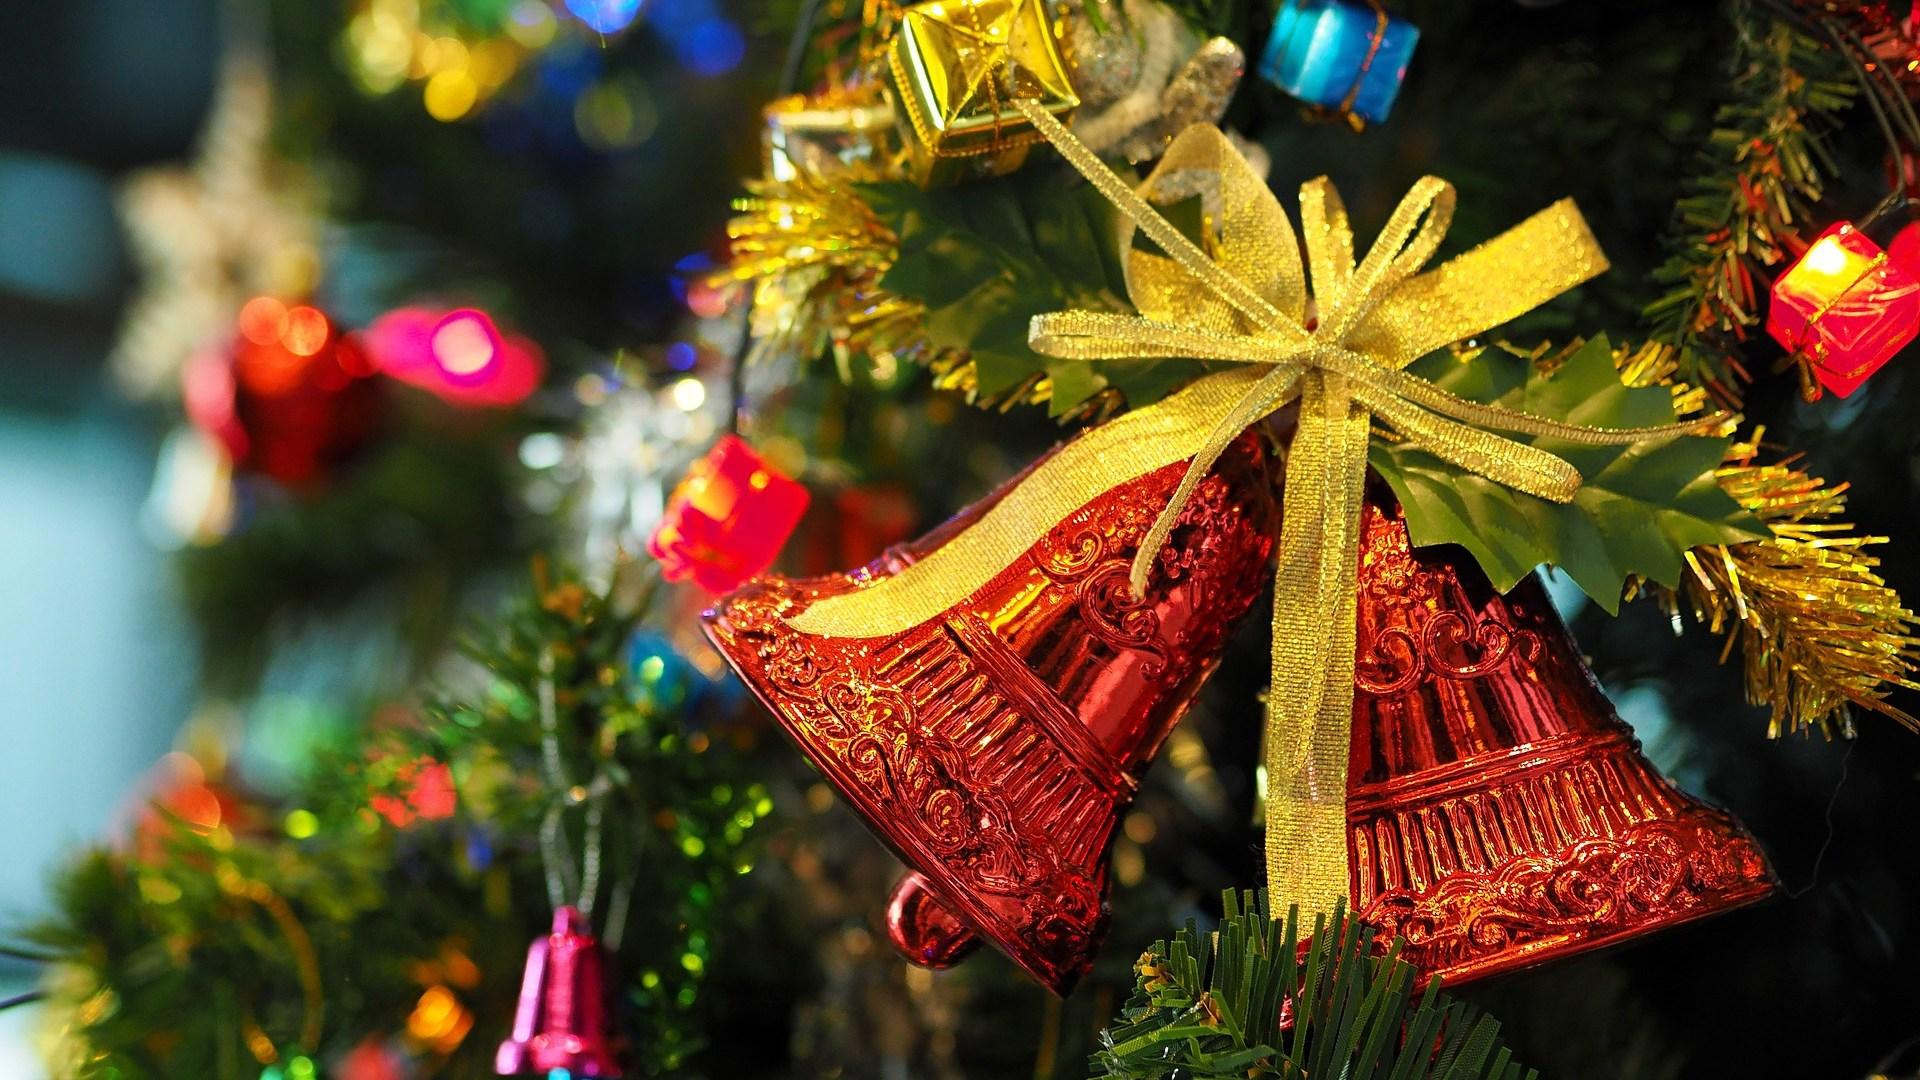 23. December - Stressjulekalenderen